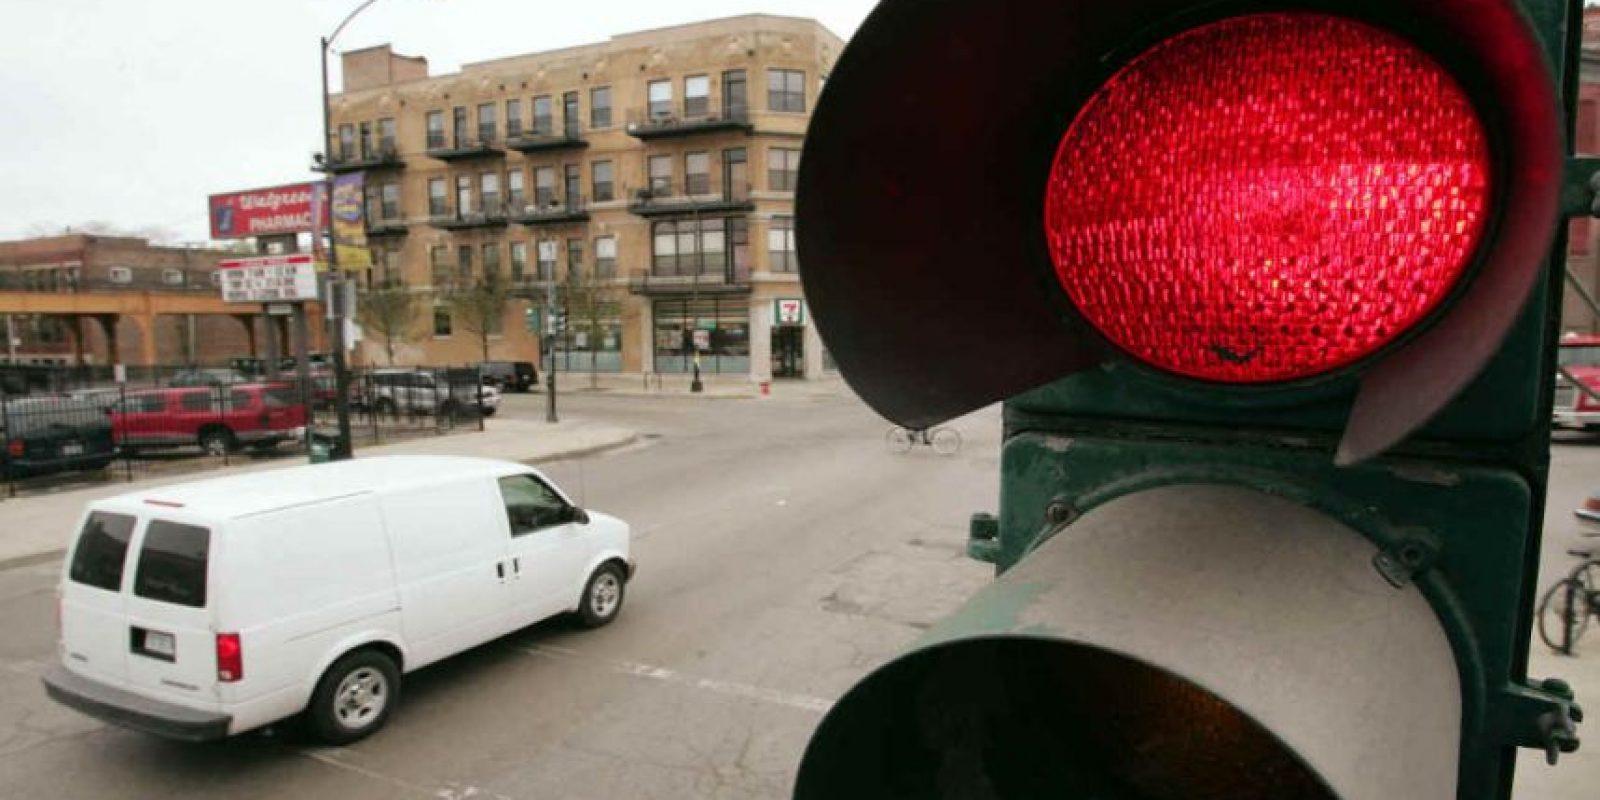 El 10 de diciembre de 1868 se instaló el primer semáforo. Foto:Getty Images